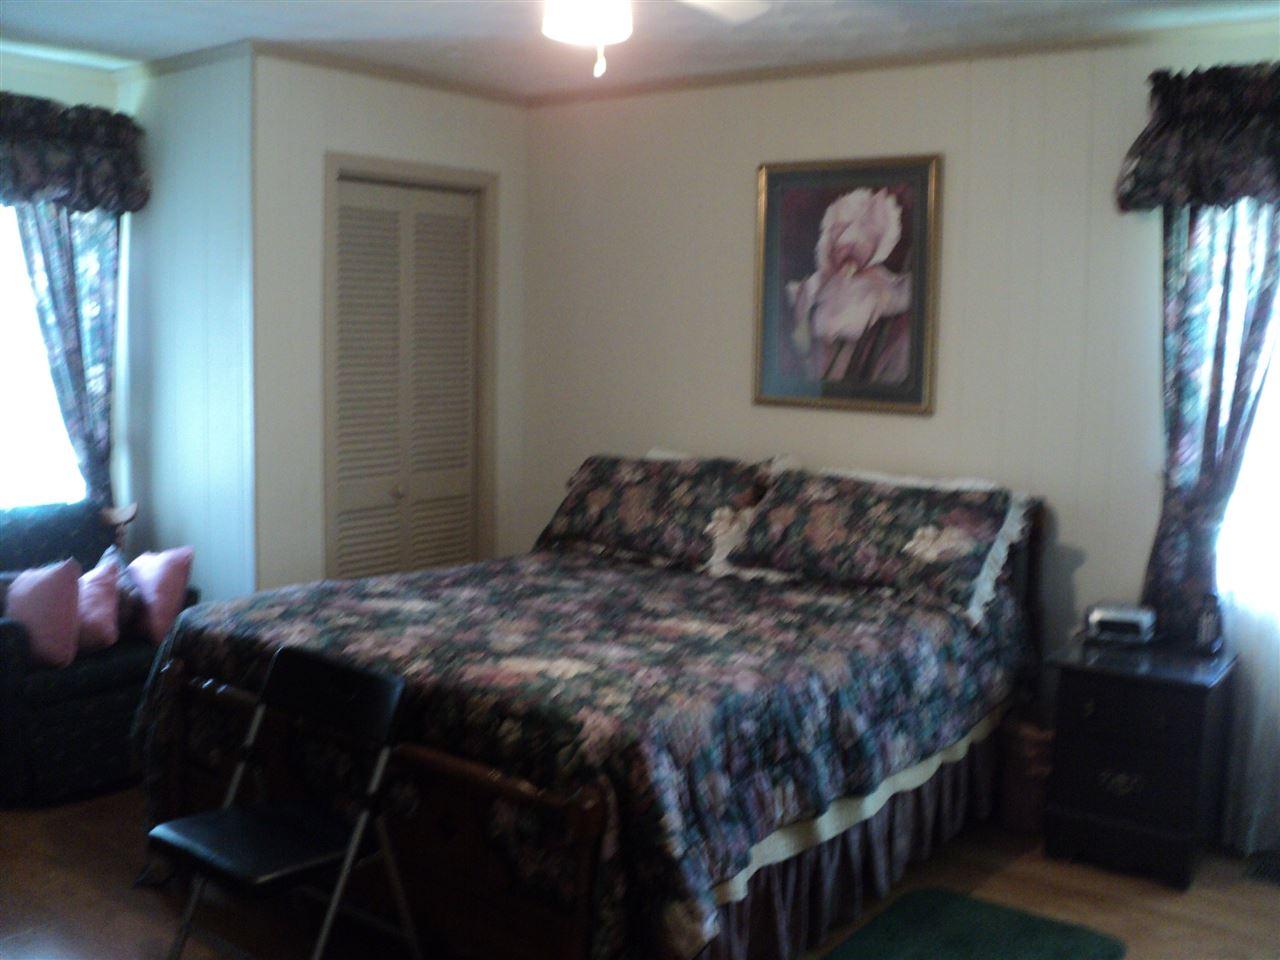 5651 N Harper Corinth, MS 38834 - MLS #: 10006108